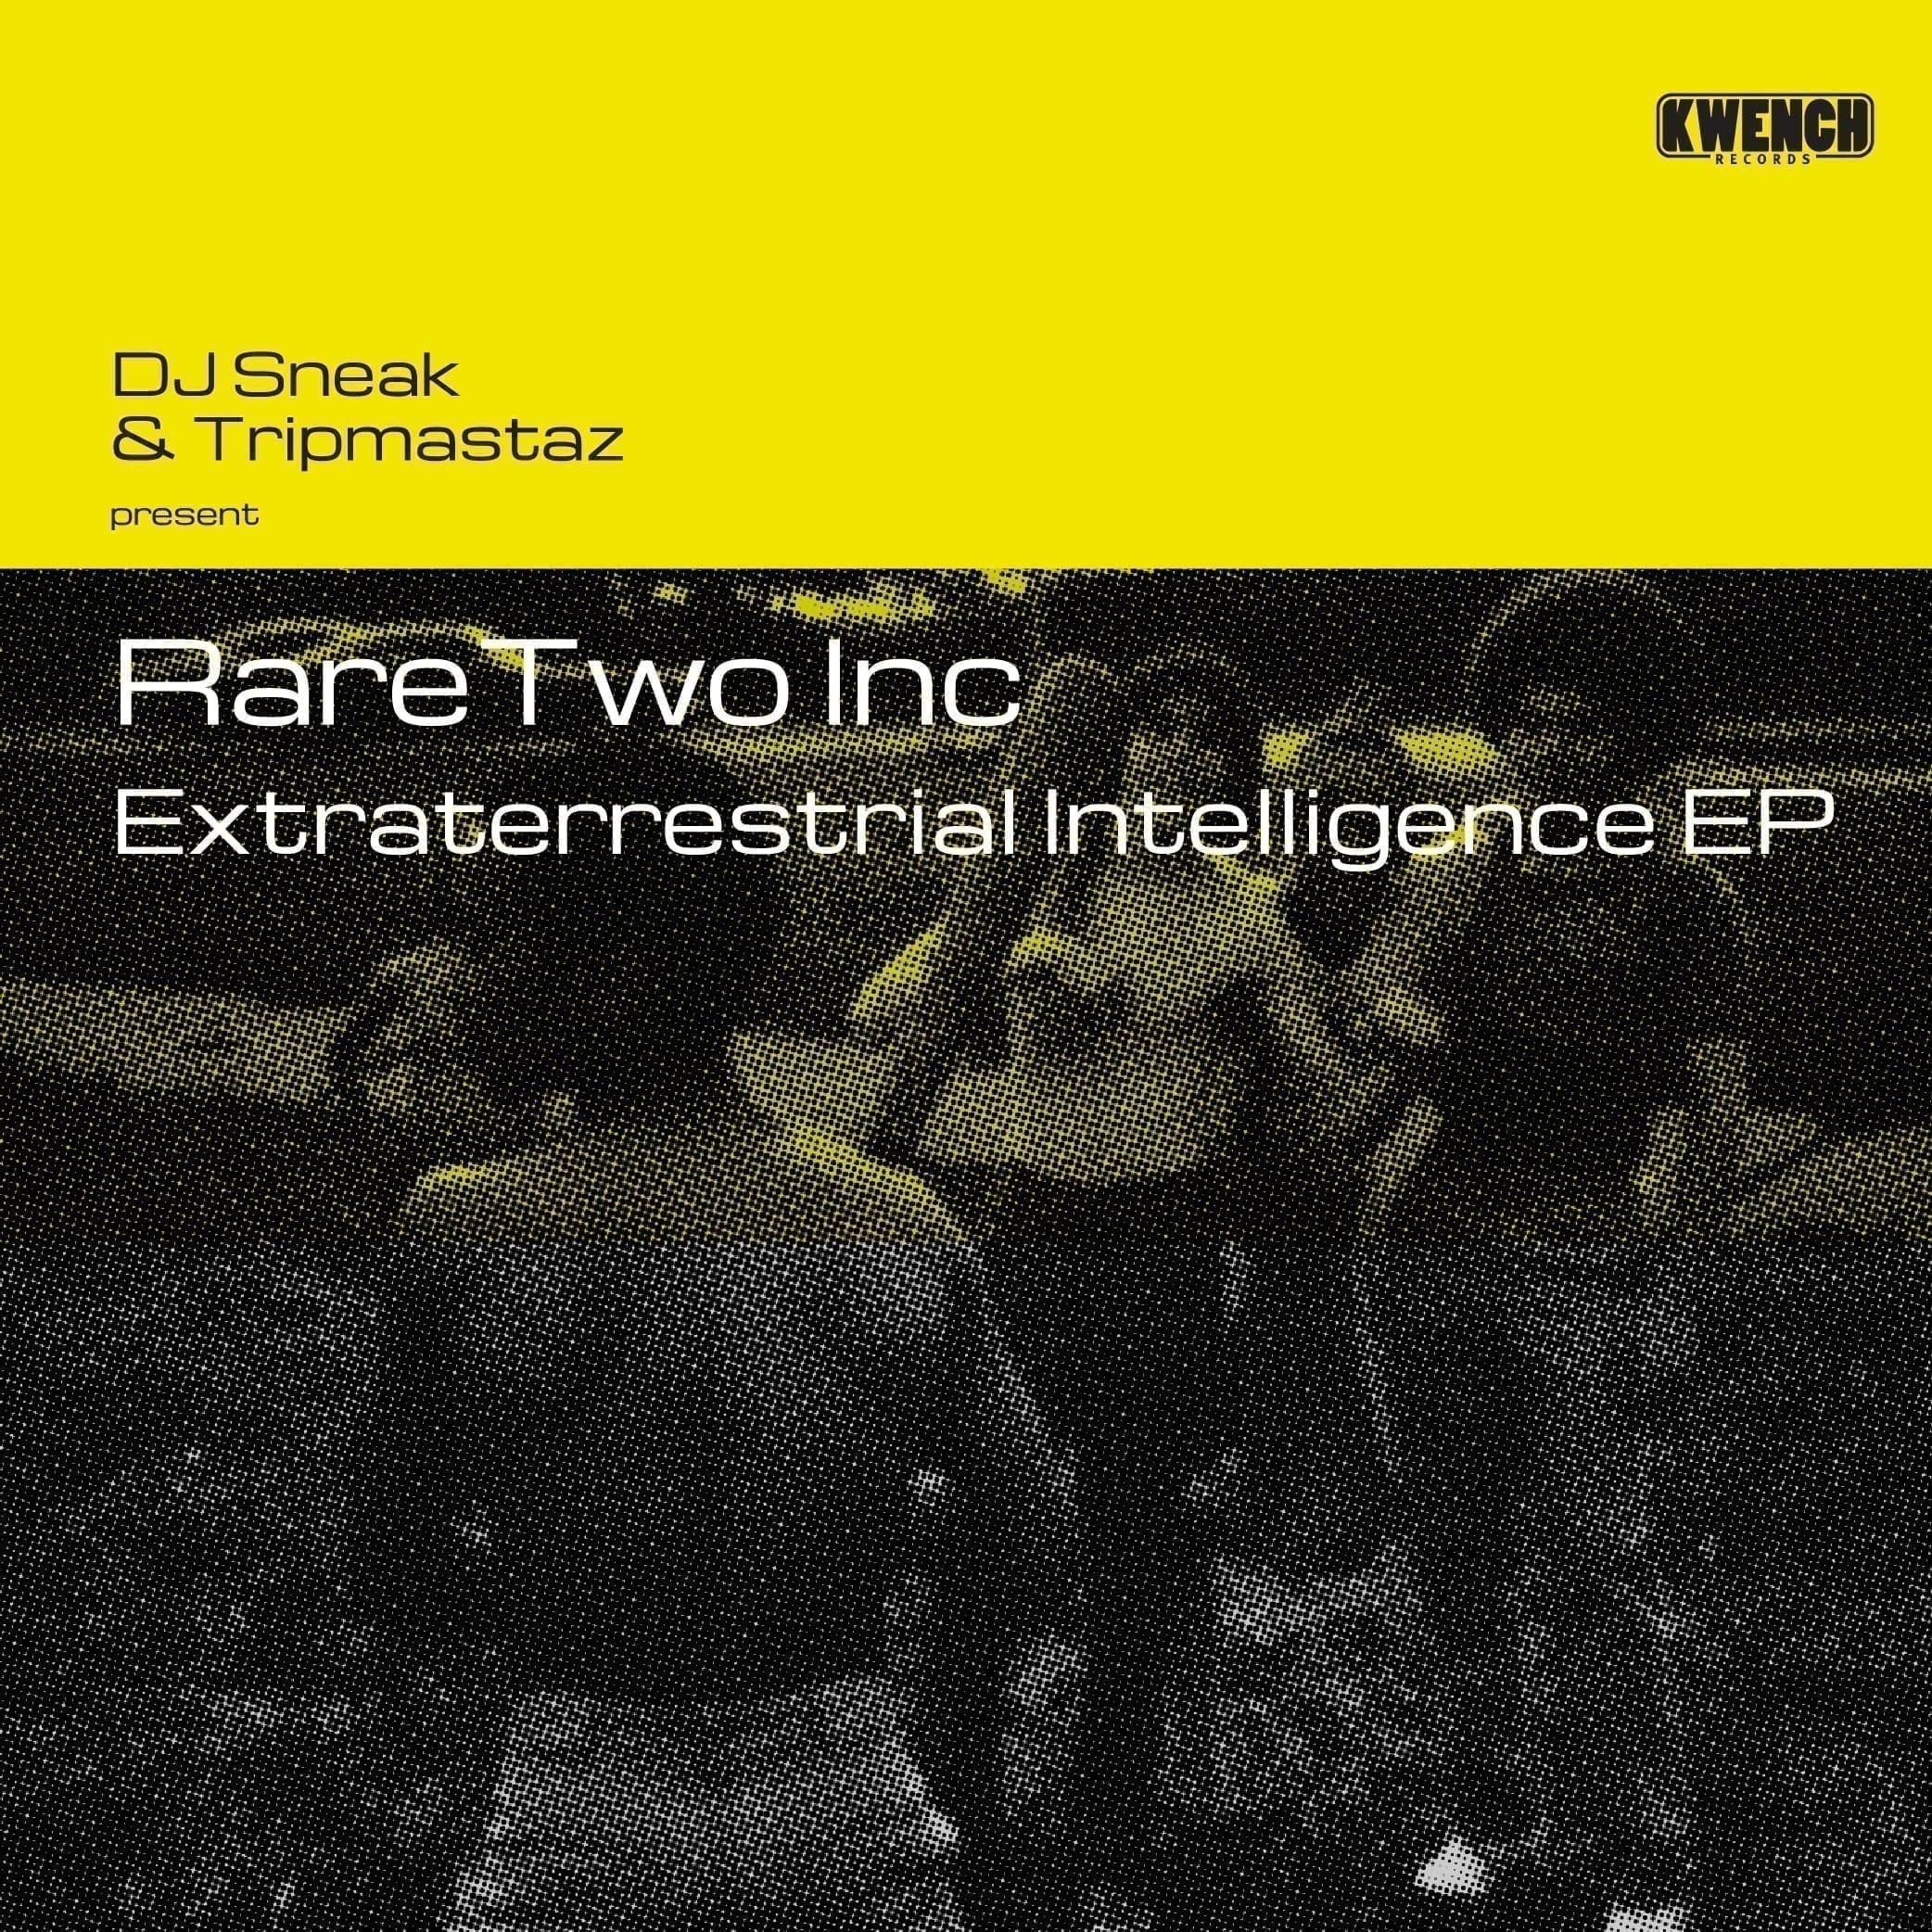 DJ Sneak & Tripmastaz present RareTwo Inc - Extraterrestrial Intelligence EP